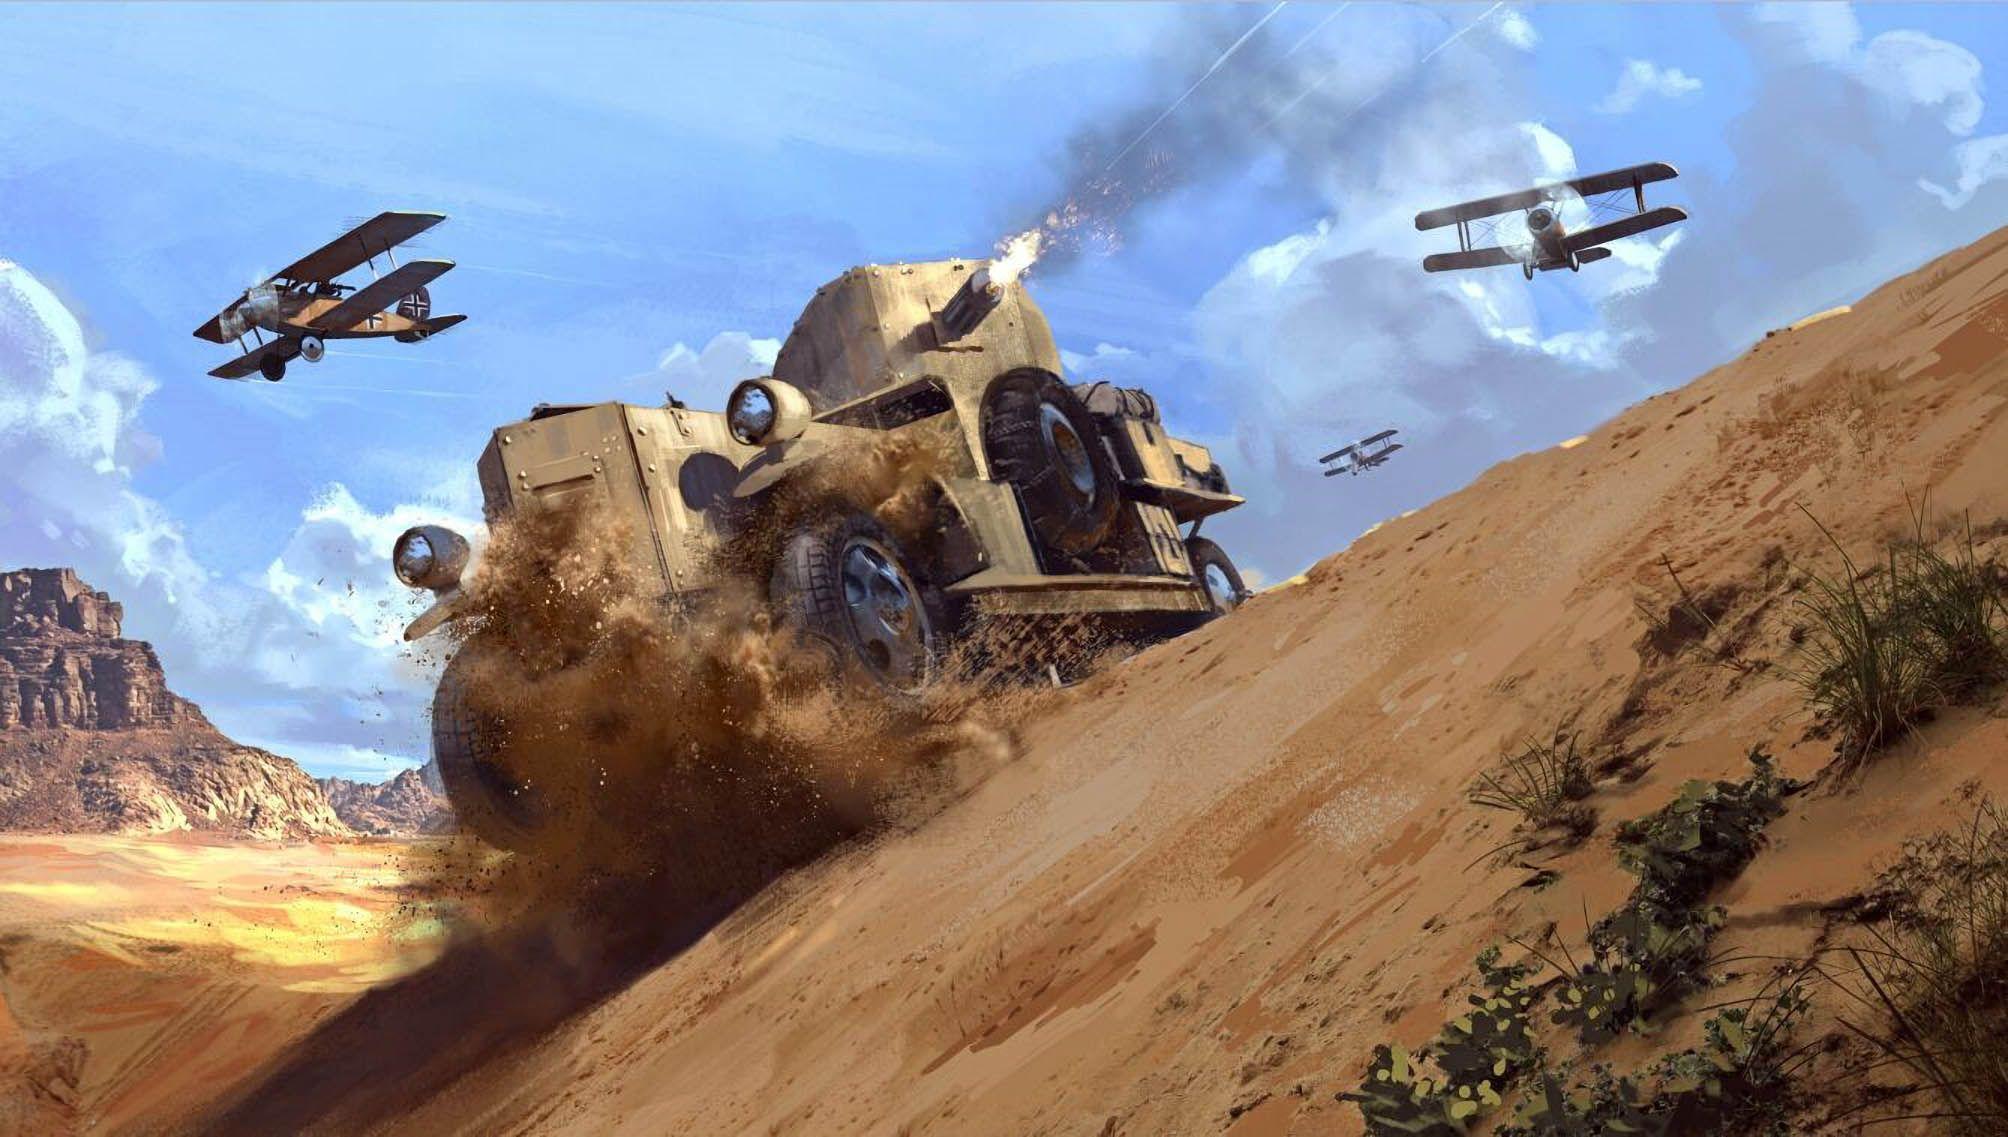 63ae3c9d2cc73560b1f8b21bbd694d77 - How To Get In A Plane In Battlefield 1